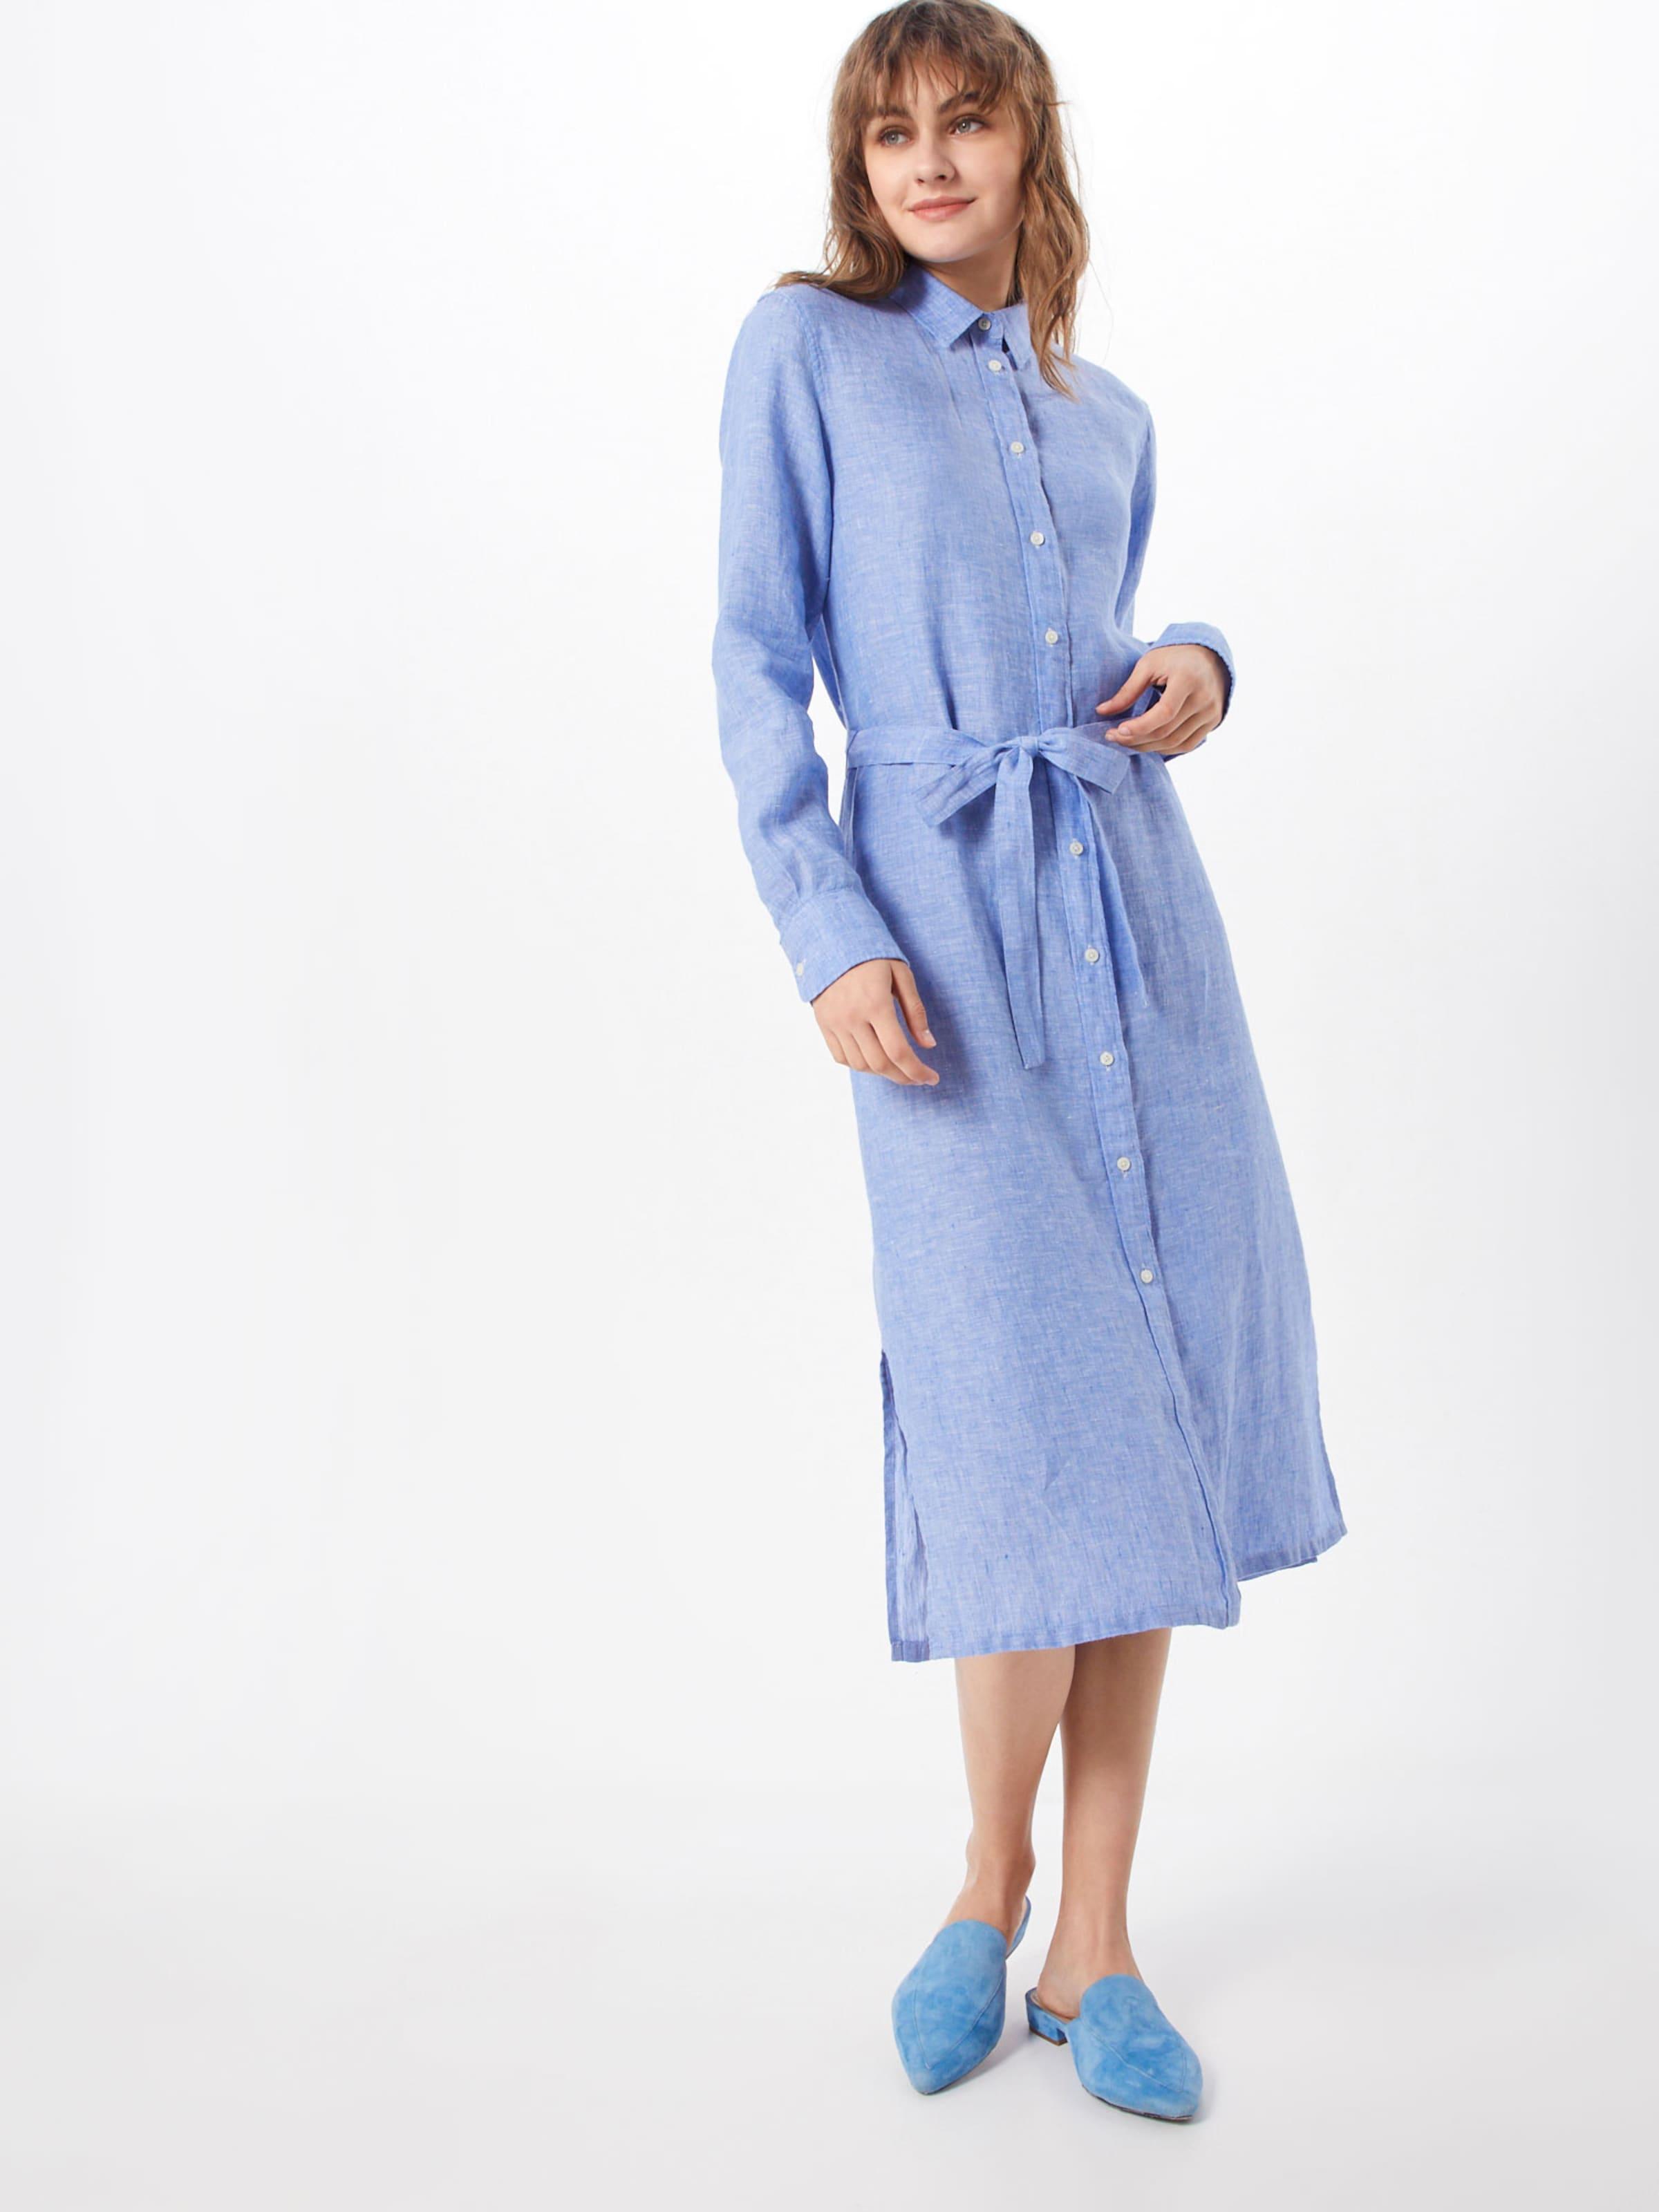 'o2Linen Gant En Bleu Clair Robe chemise Chambray' kXZPiu